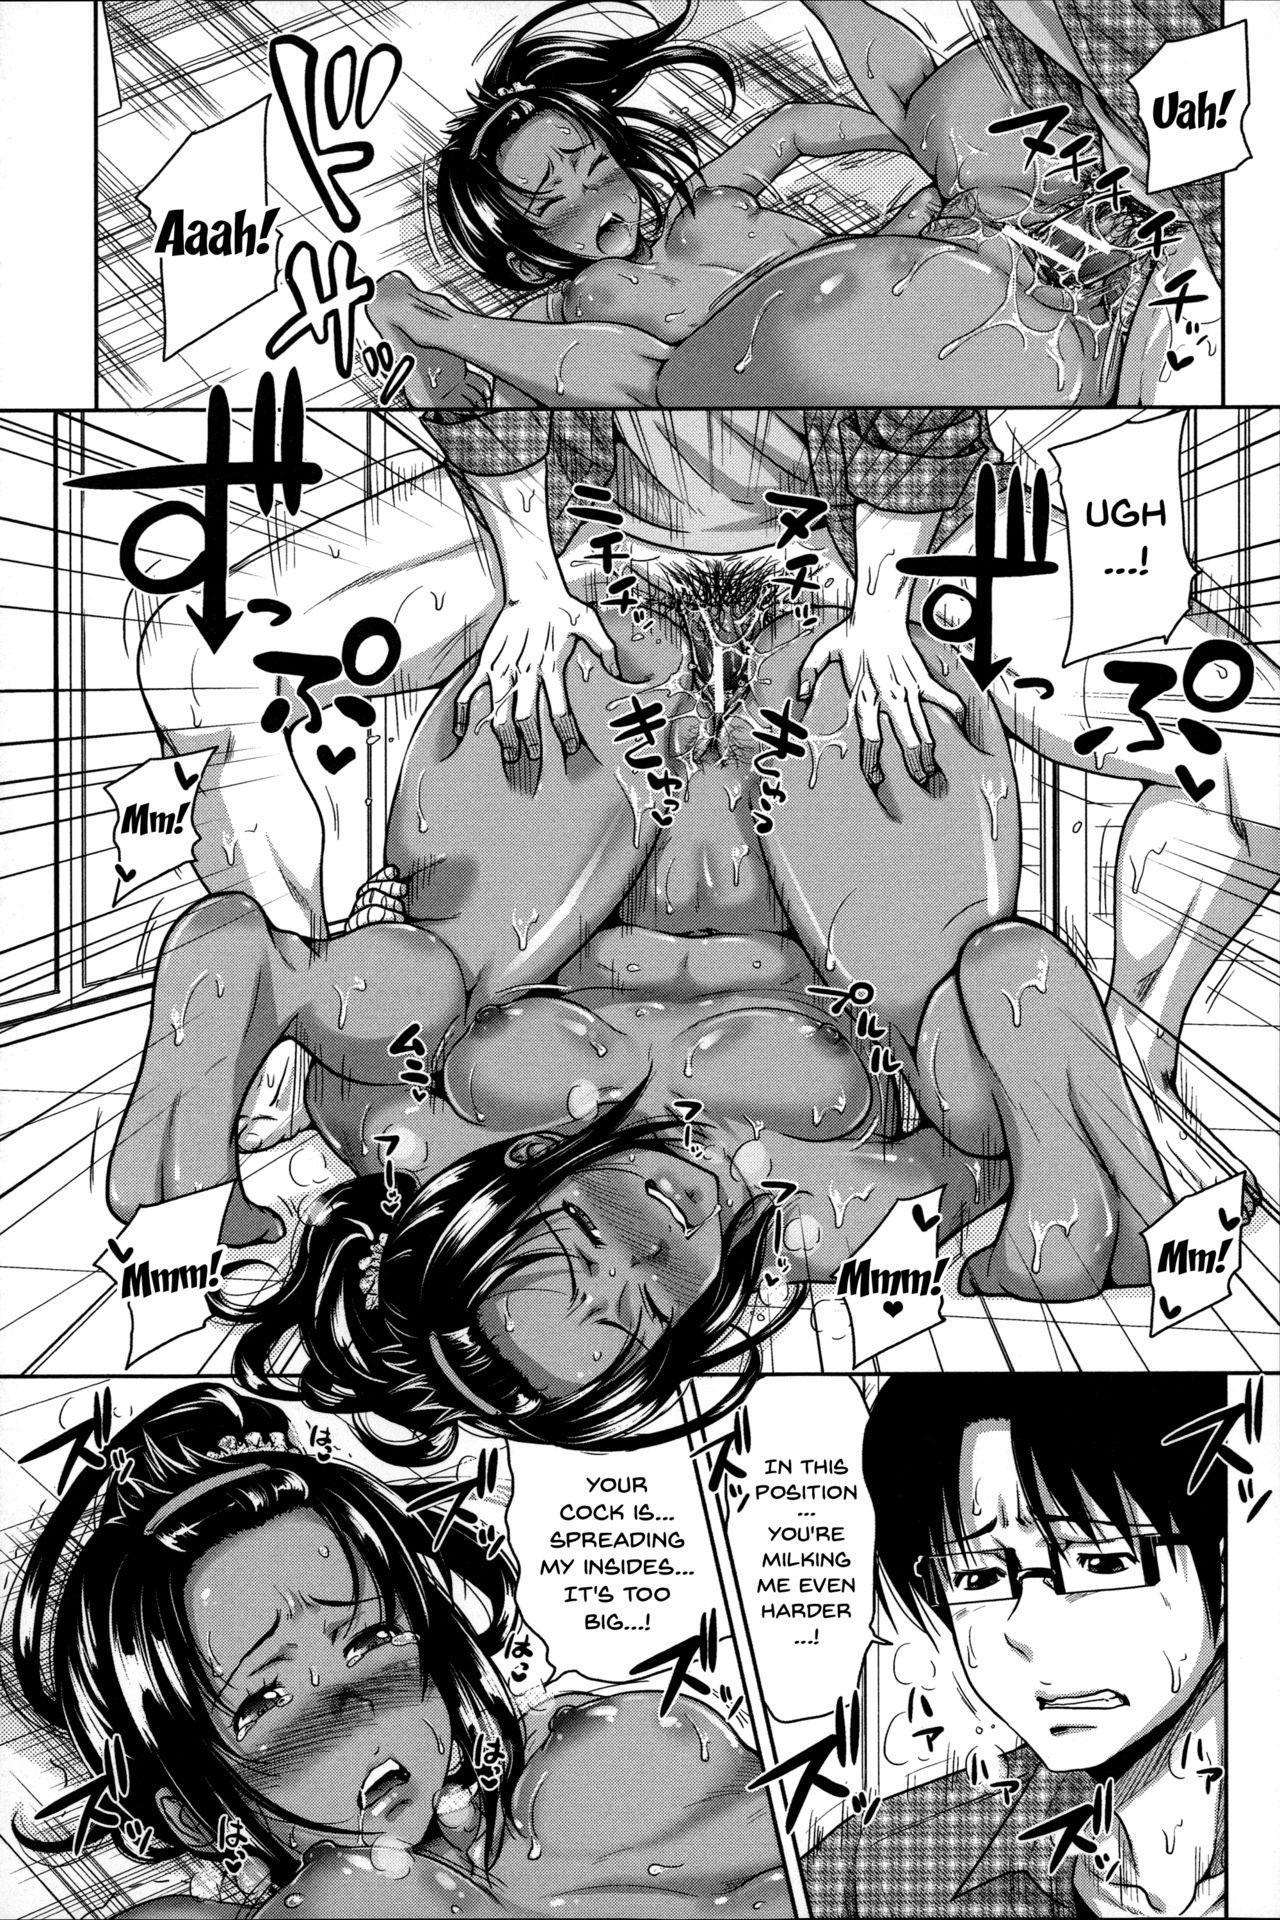 Pakotate! Seikouritsu 0% no Teppeki Bishojo VS Seikouritsu 100% no Hentai Katei Kyoushi   Pakotate! Sex Rate 0% Iron-Willed Beautiful Virgins VS Sex Rate 100% Perverted Coach 82